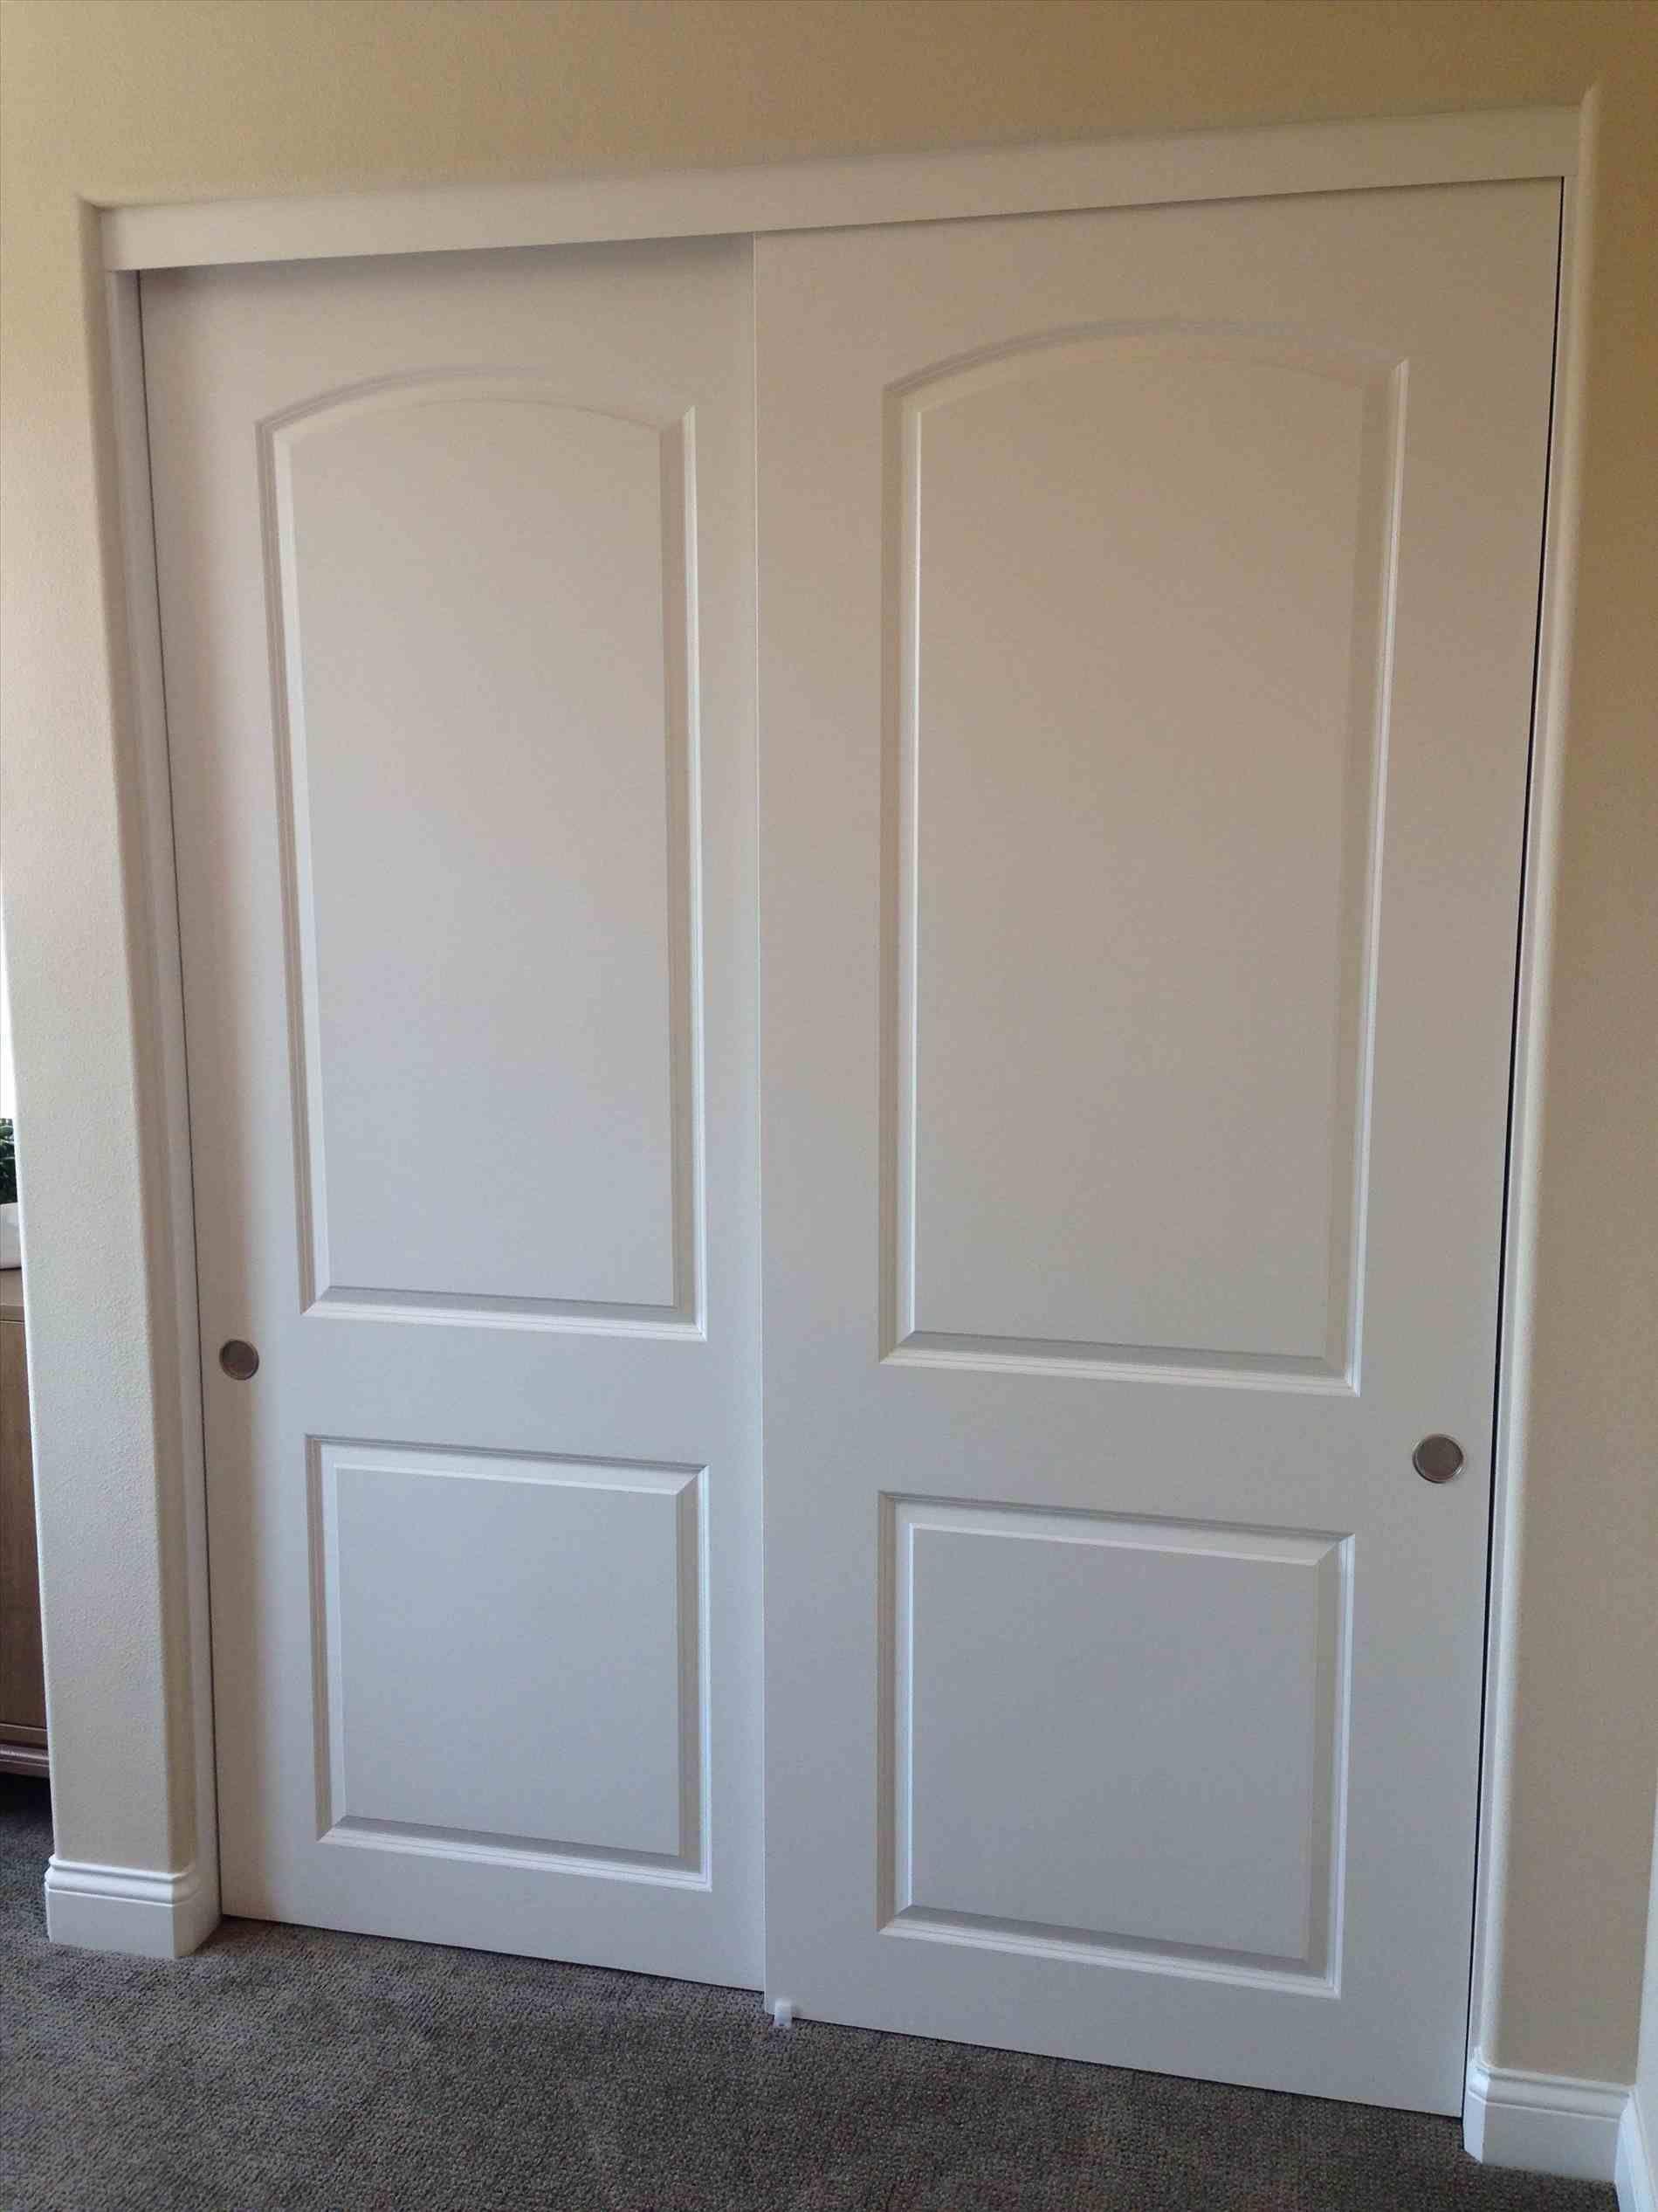 New Post Home Depot Closet Doors Sliding Visit Bobayule Trending